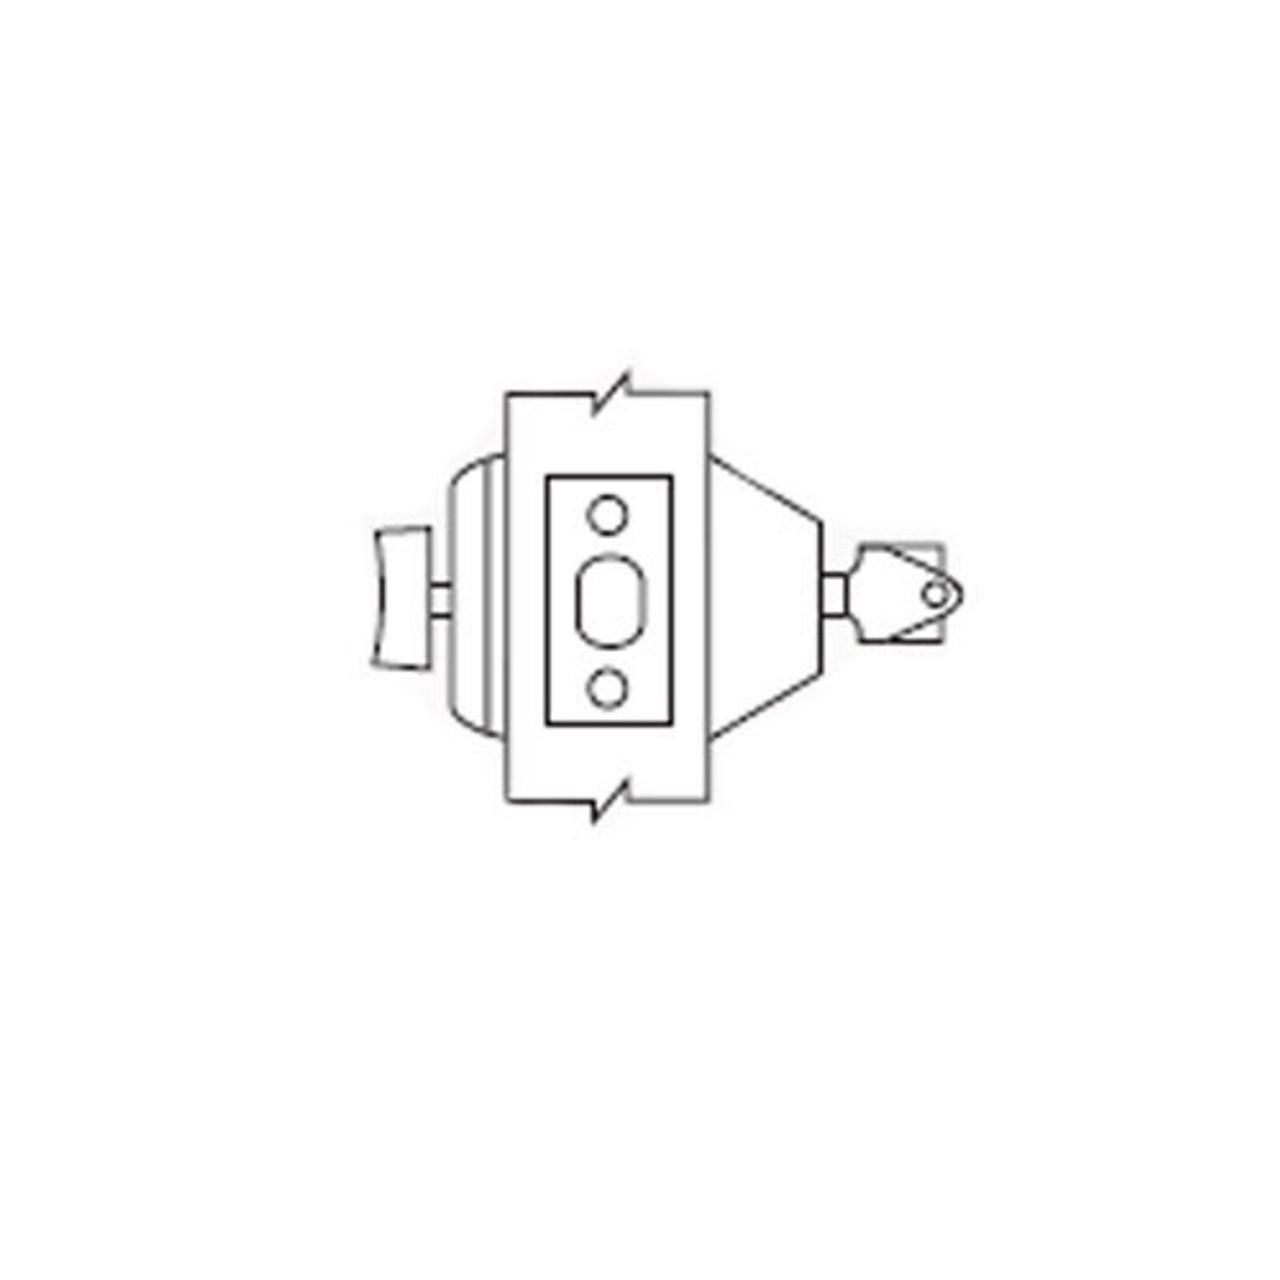 d61 10b arrow lock d series deadbolt single cylinder with thumbturn in dark oxidized satin [ 1280 x 1280 Pixel ]